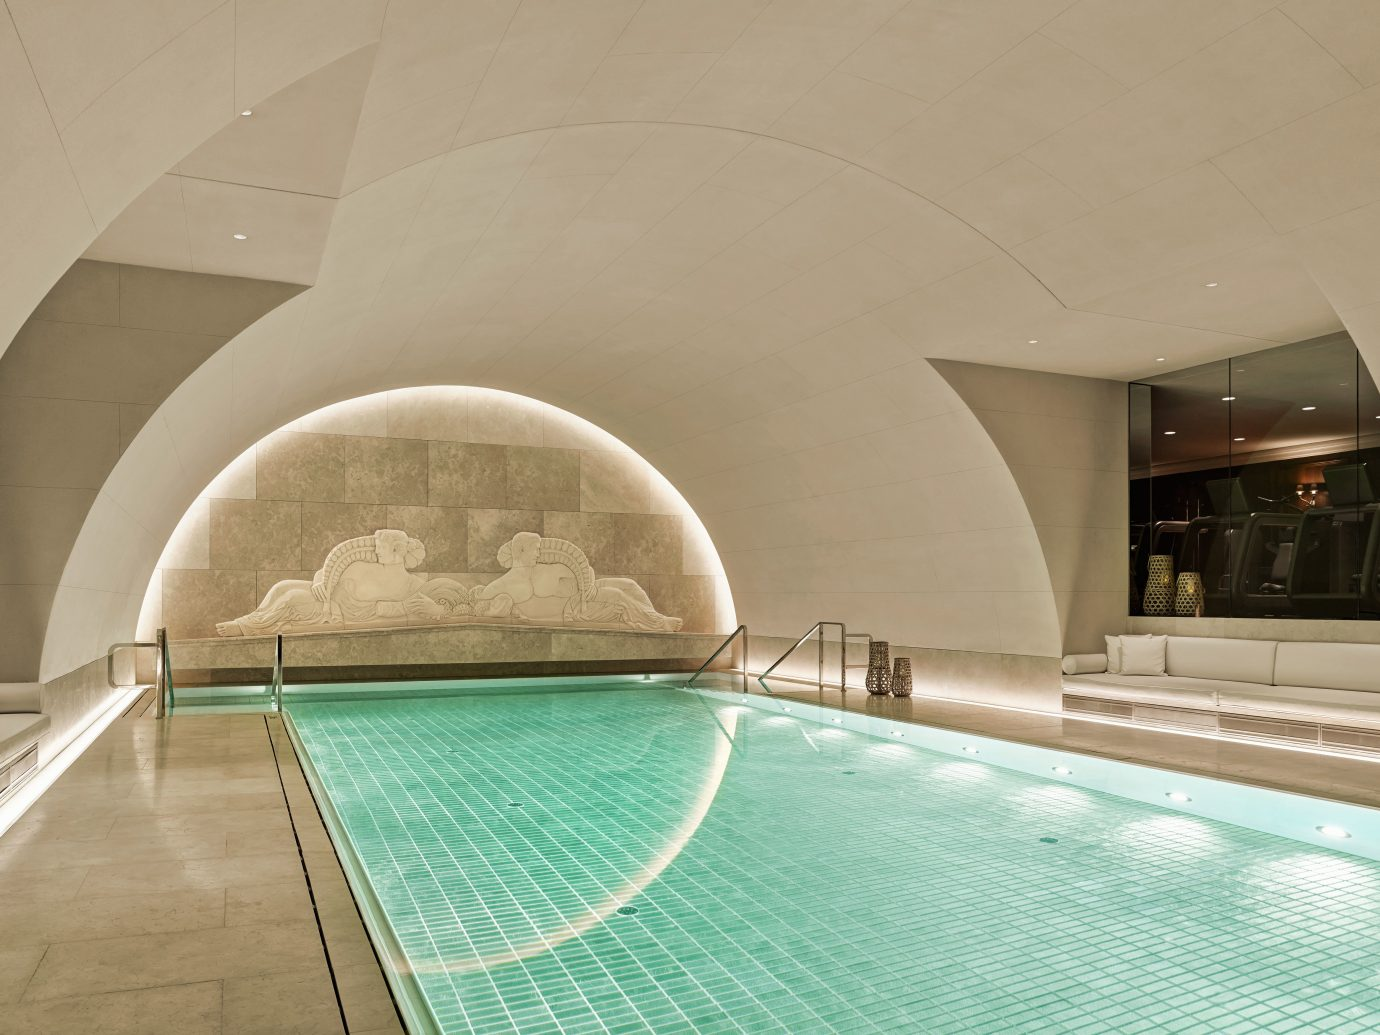 Austria europe Fitness Hotels Lounge Pool Sport Vienna Wellness indoor floor property swimming pool room Architecture estate interior design step